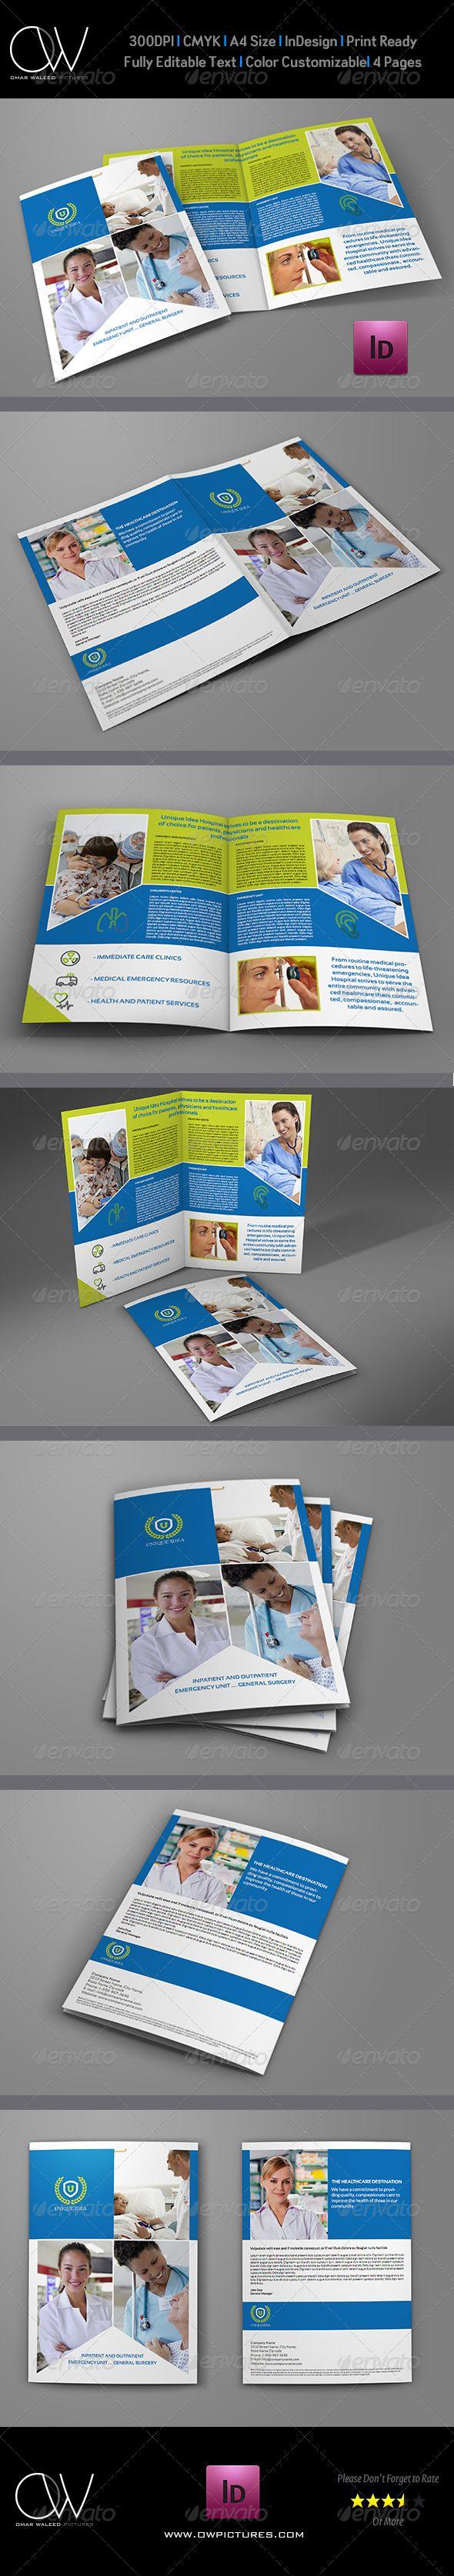 Hospital BiFold Brochure Template Brochure Template Brochures - Bi fold brochure template indesign